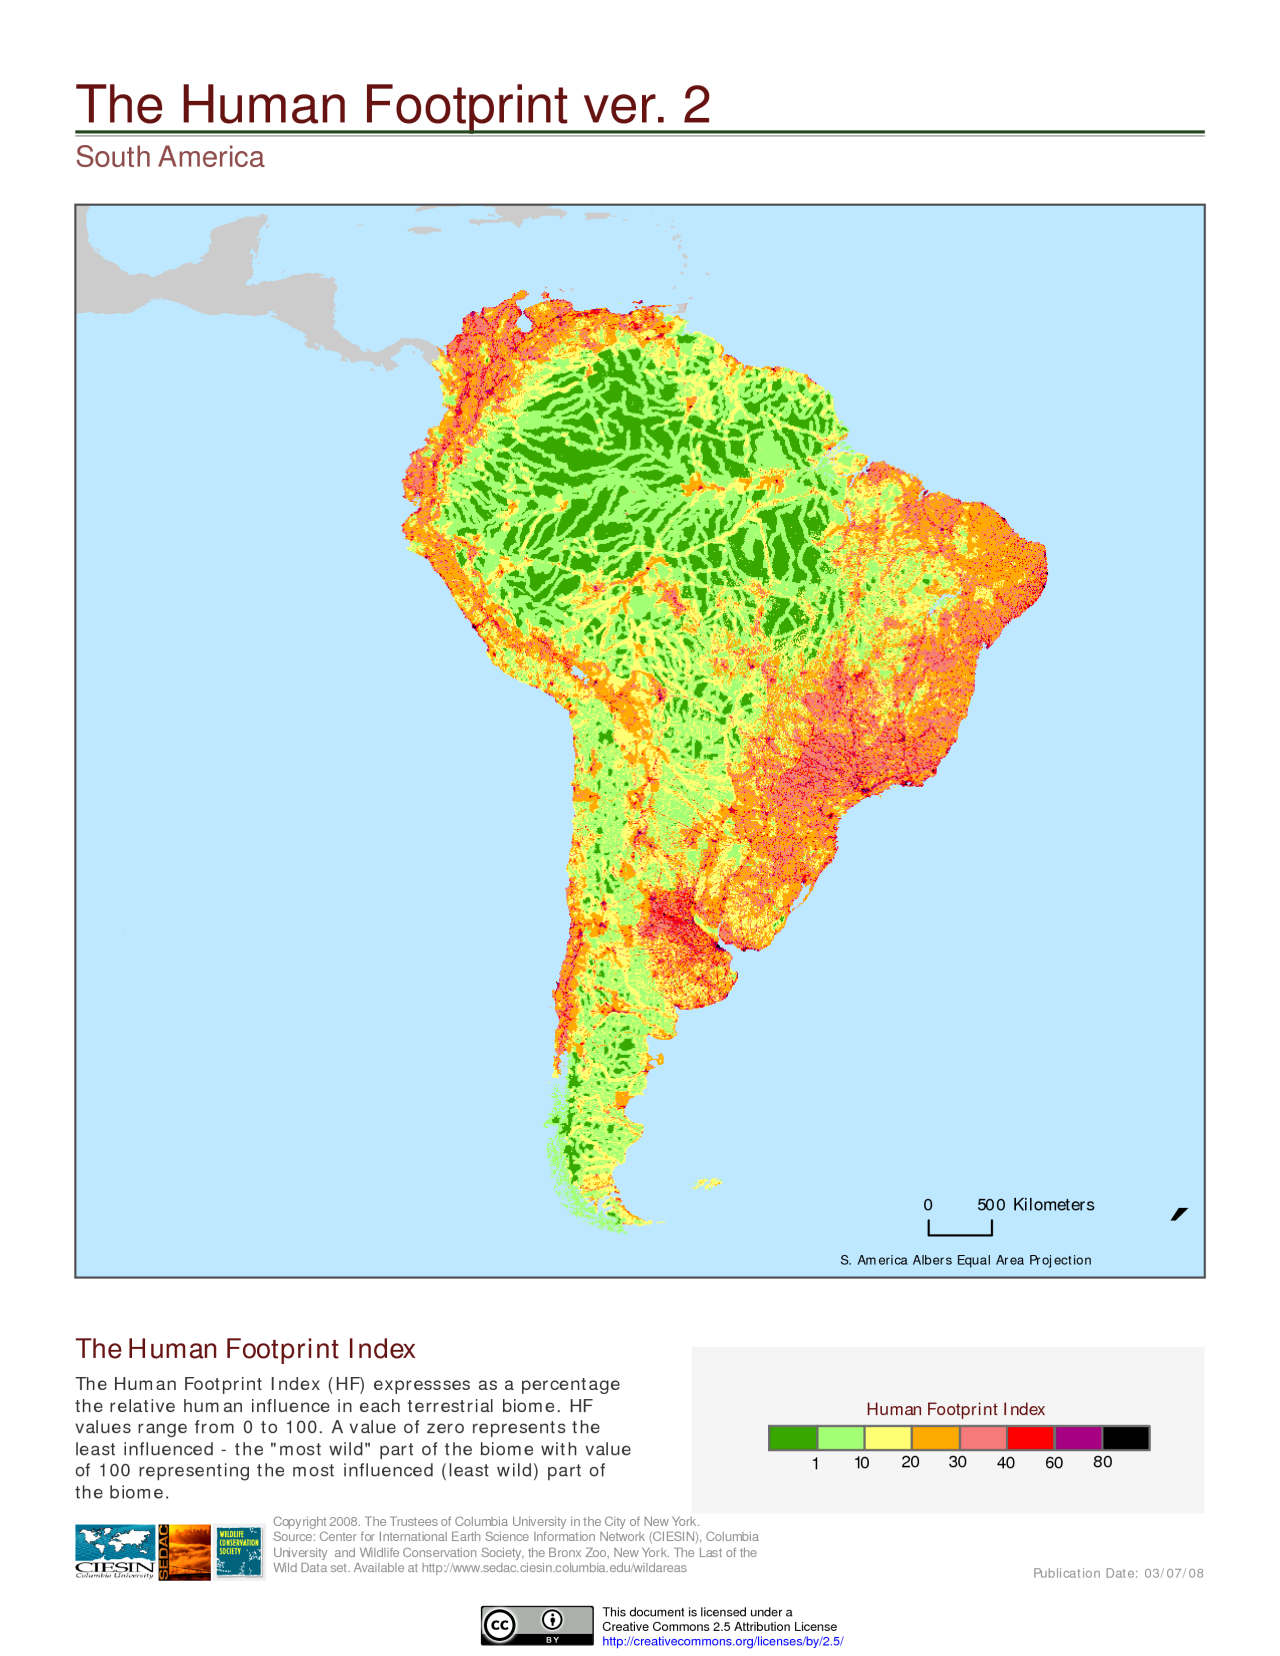 The Human Footprint On South America